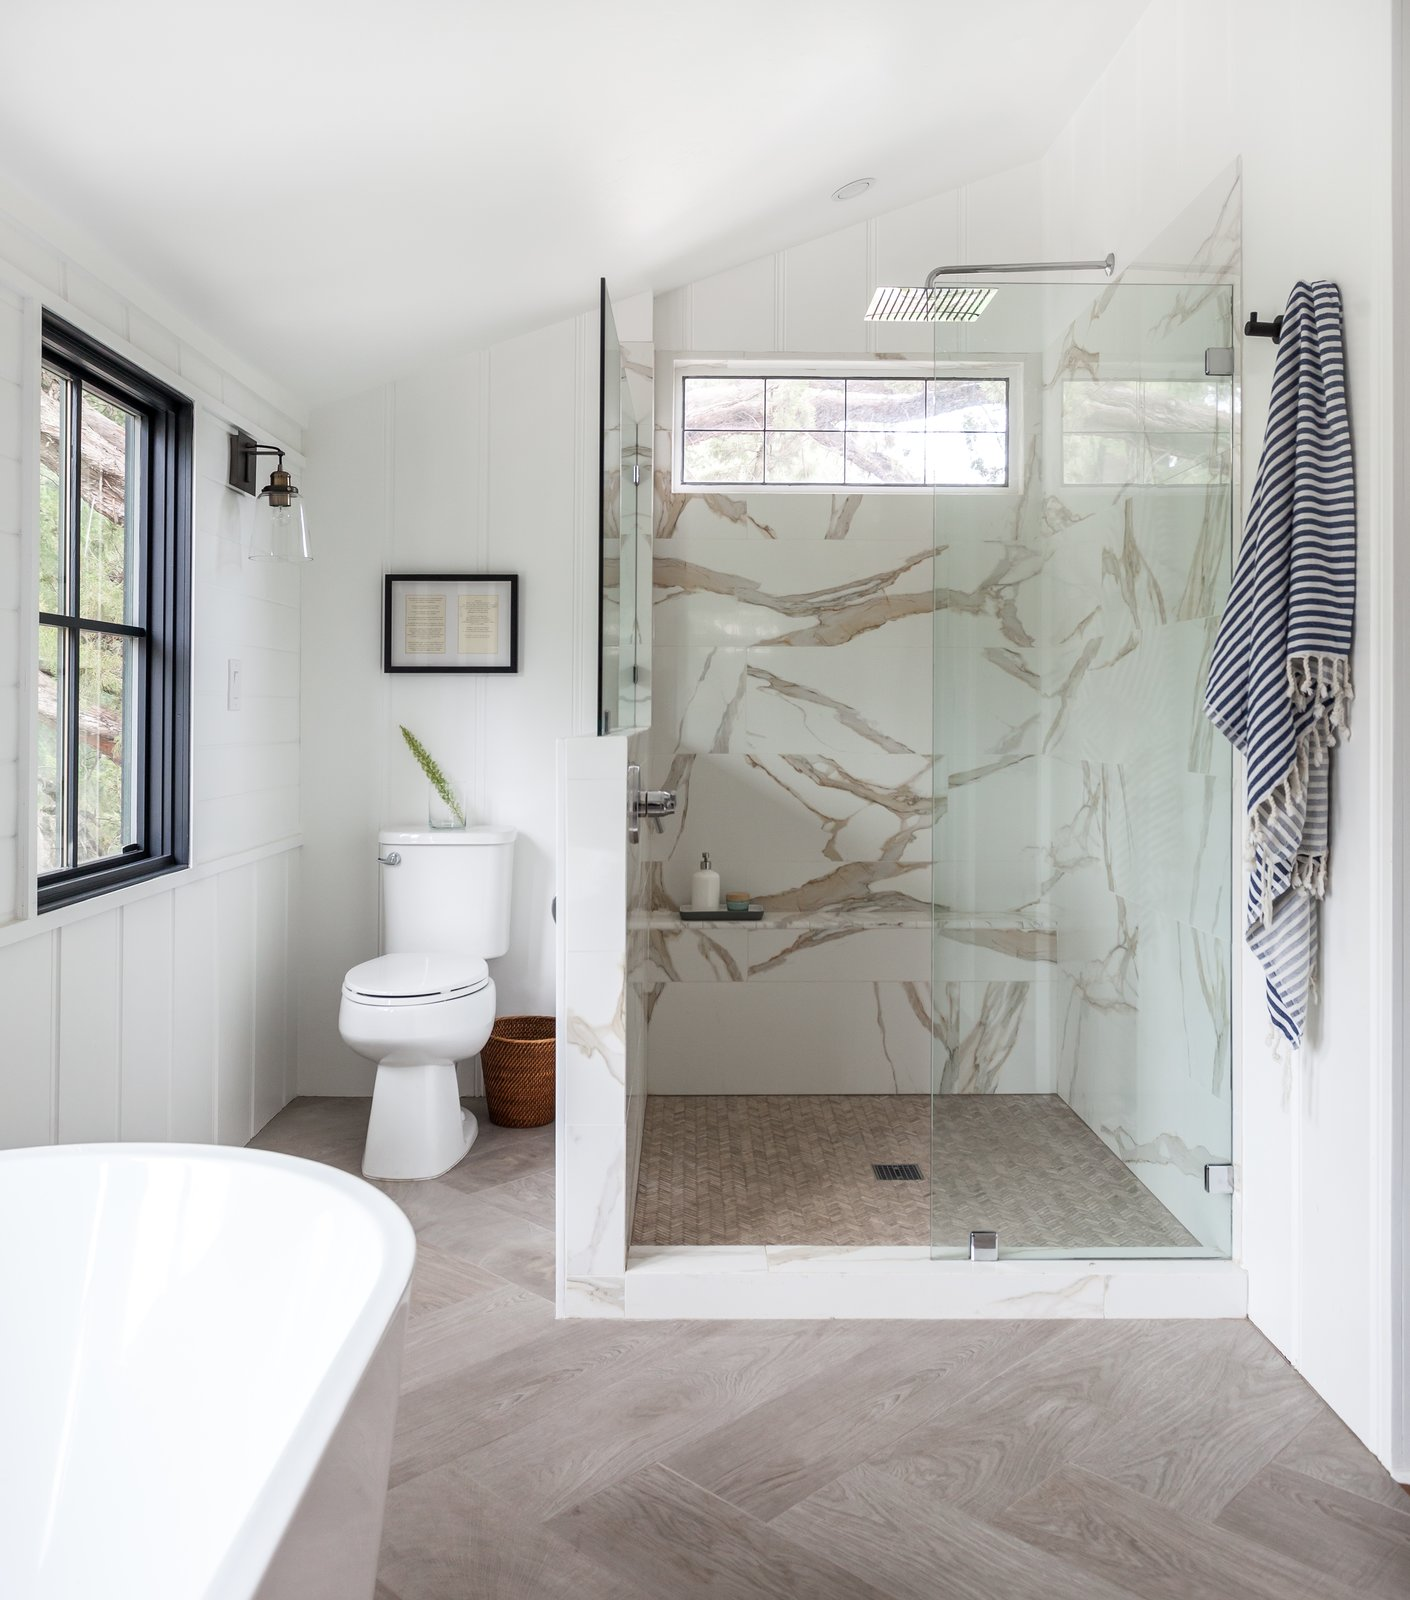 Spanish Revival by Colossus Mfg Master Bathroom